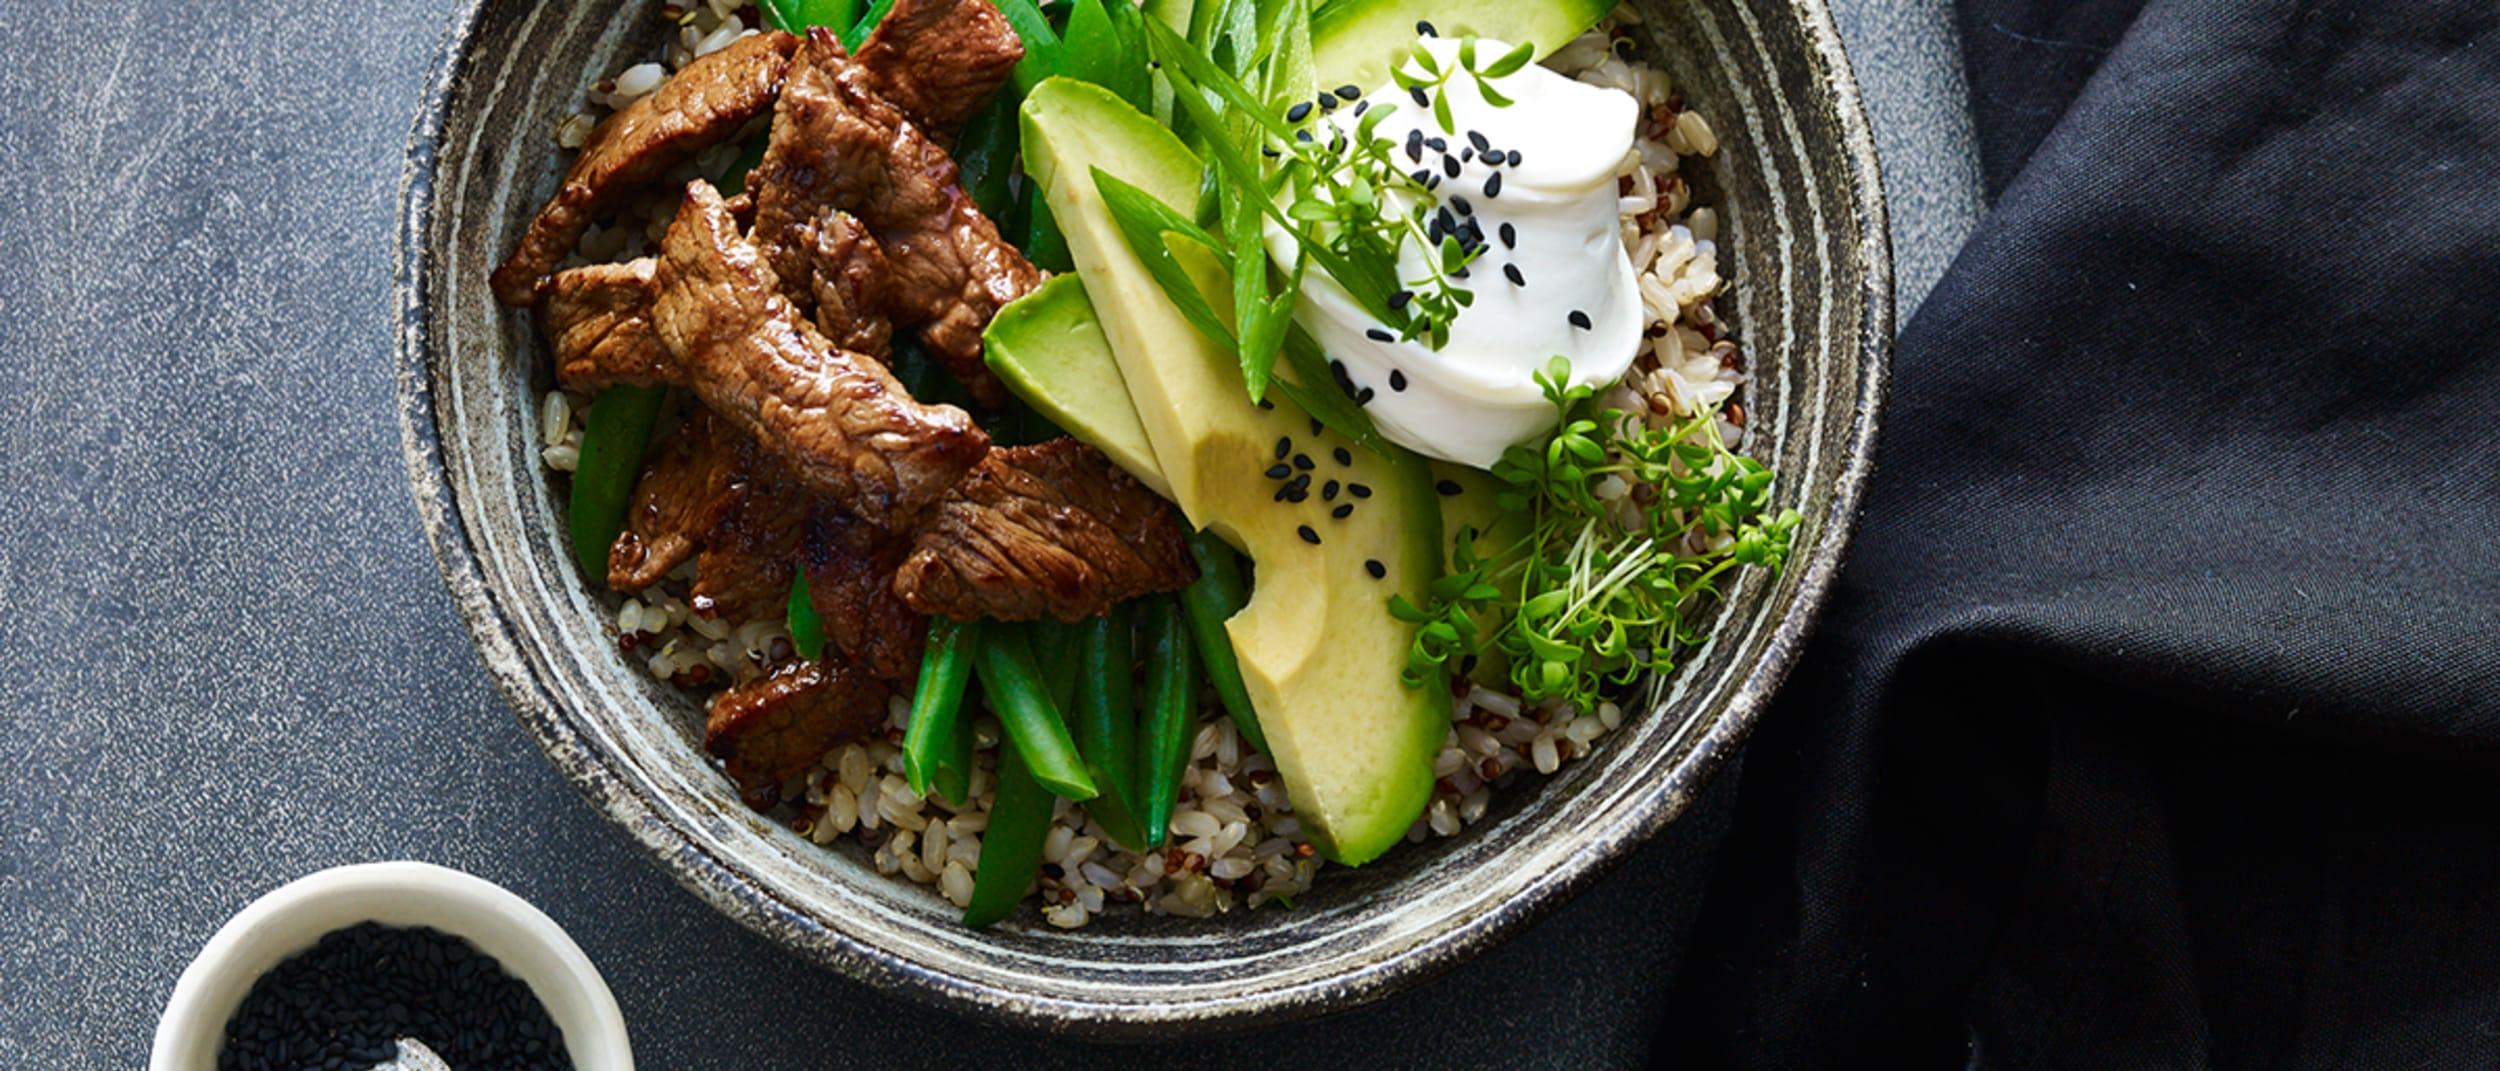 Sesame beef, avocado and labne poke bowls